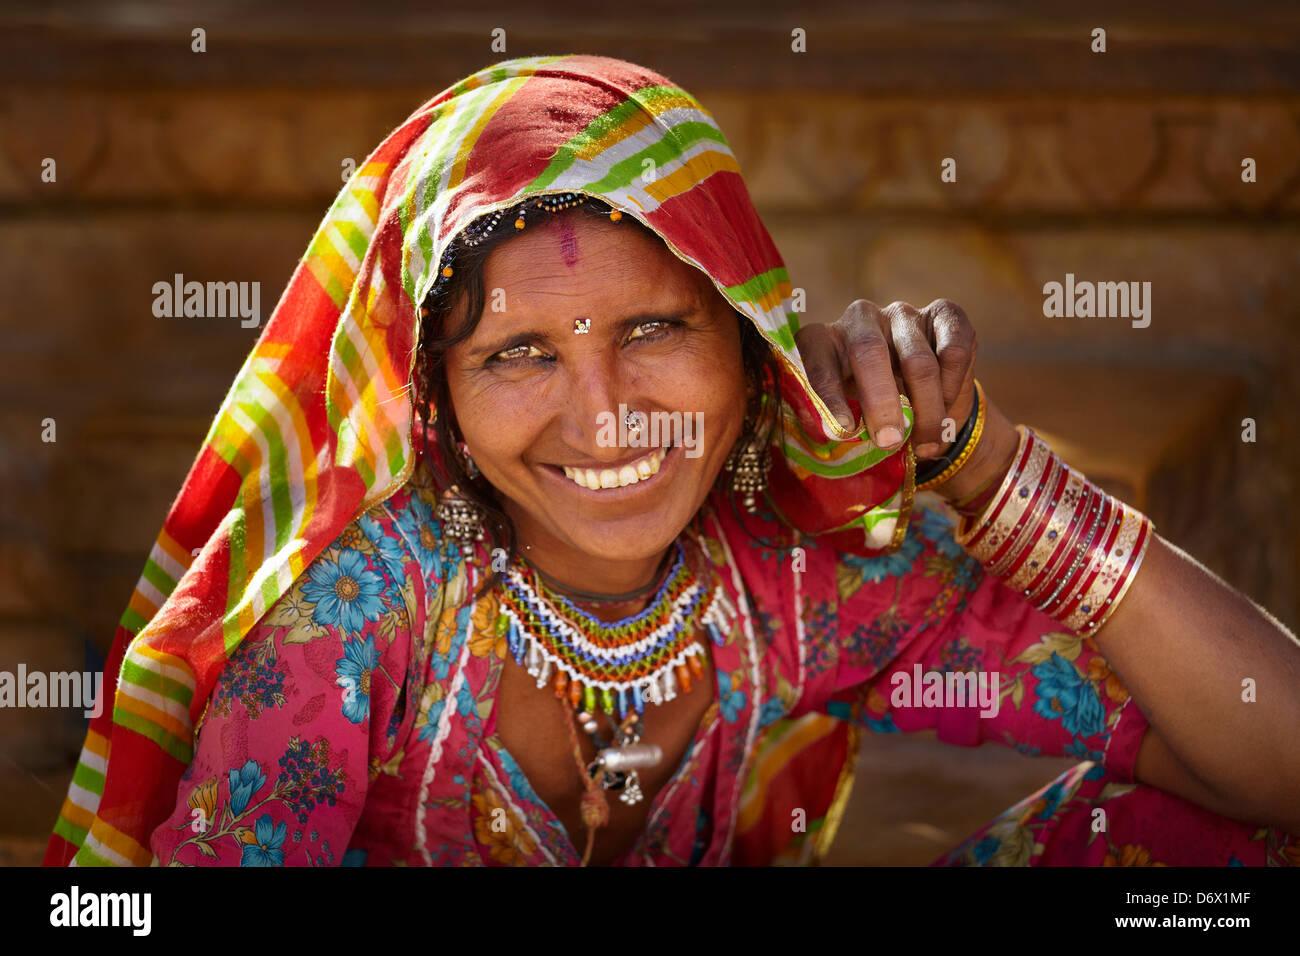 Portrait of smiling india woman, Jaisalmer, Rajasthan State, India - Stock Image